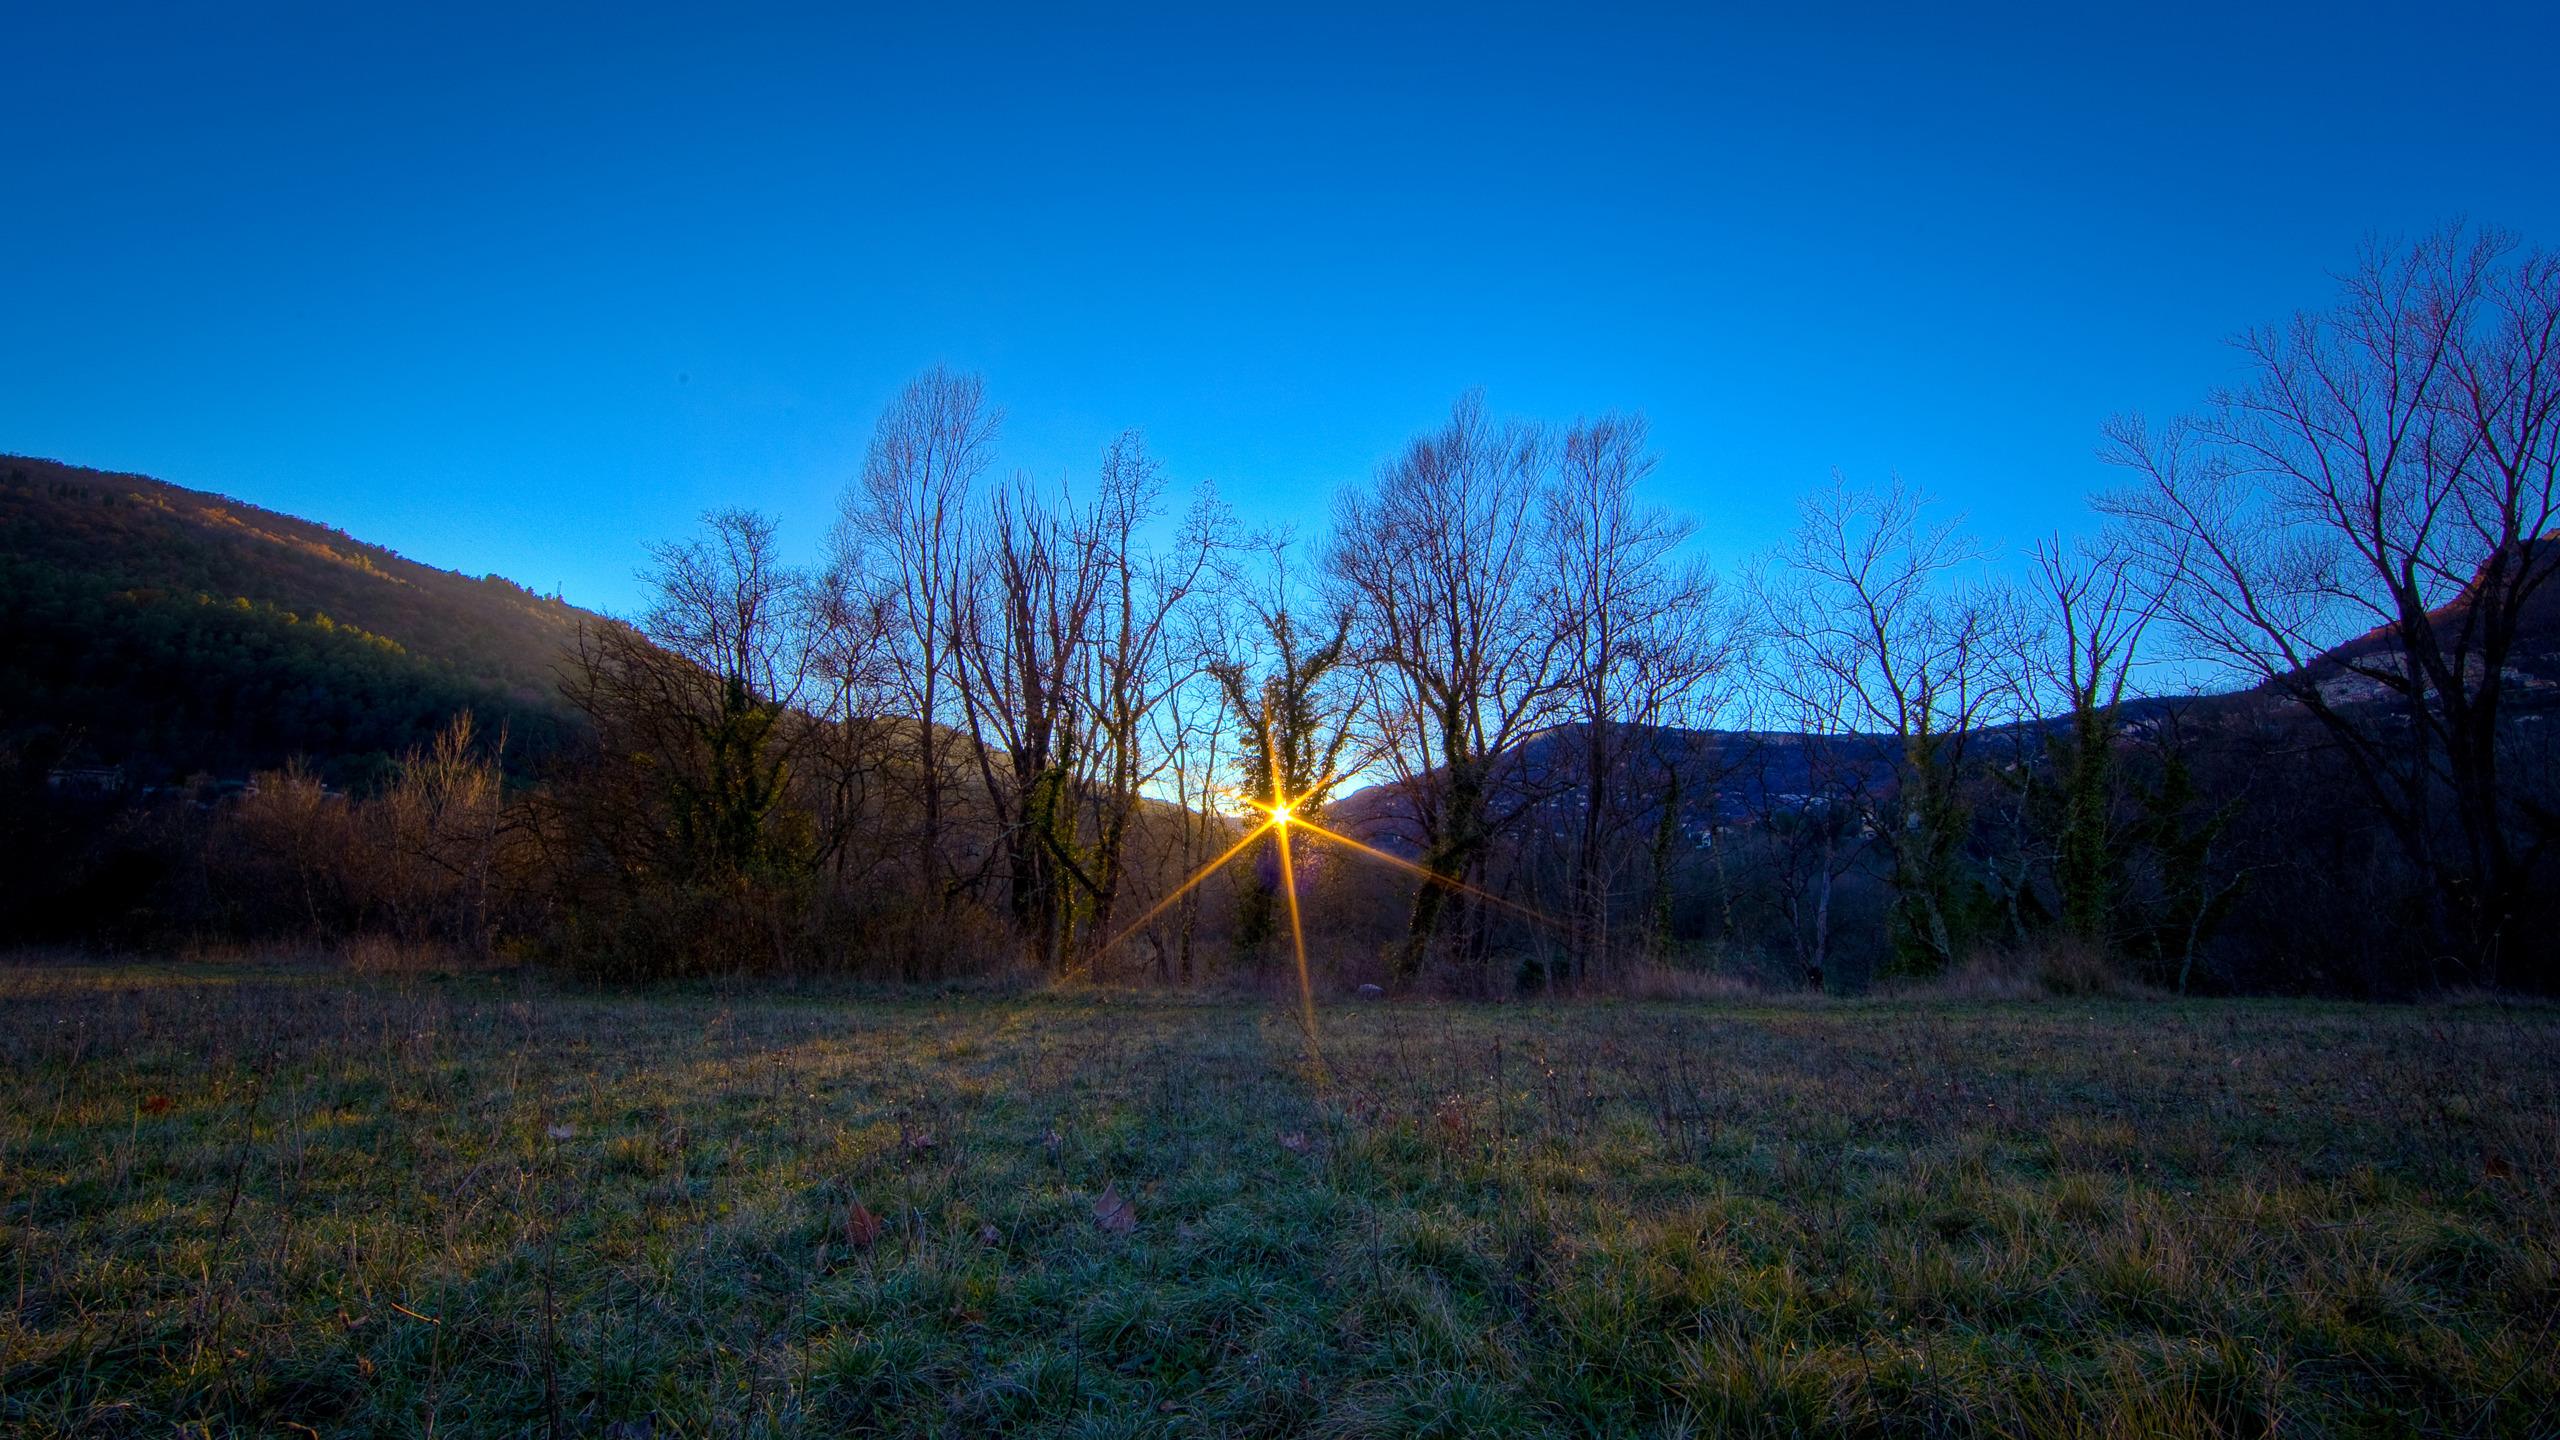 закат склон sunset the slope  № 1569378 бесплатно